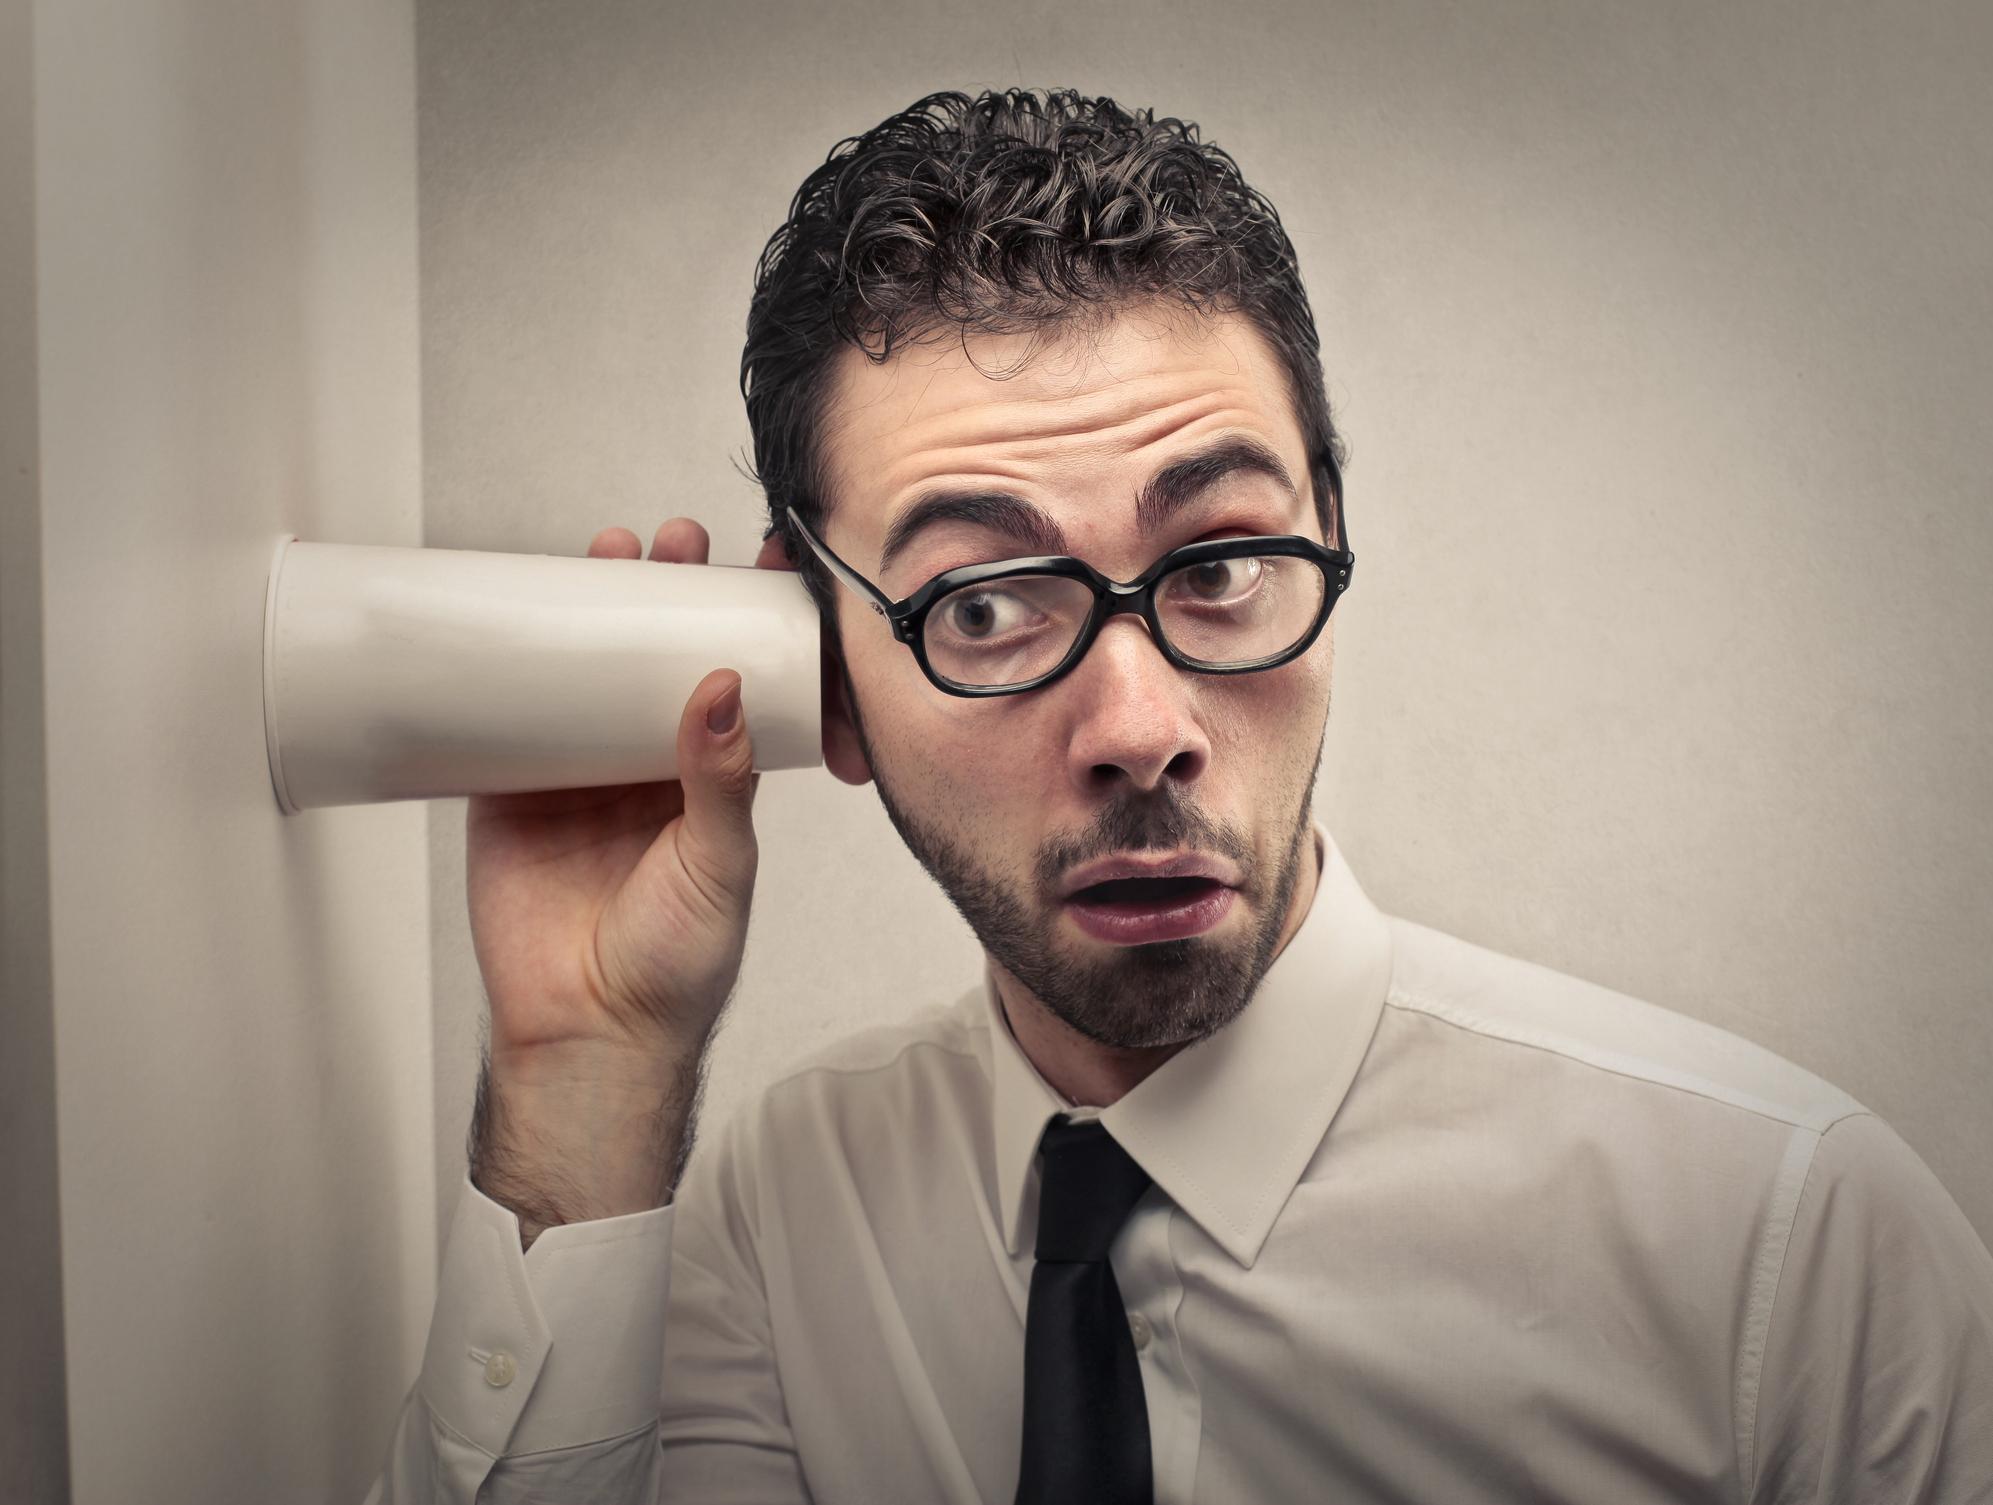 A man listens through a wall using a plastic cup.